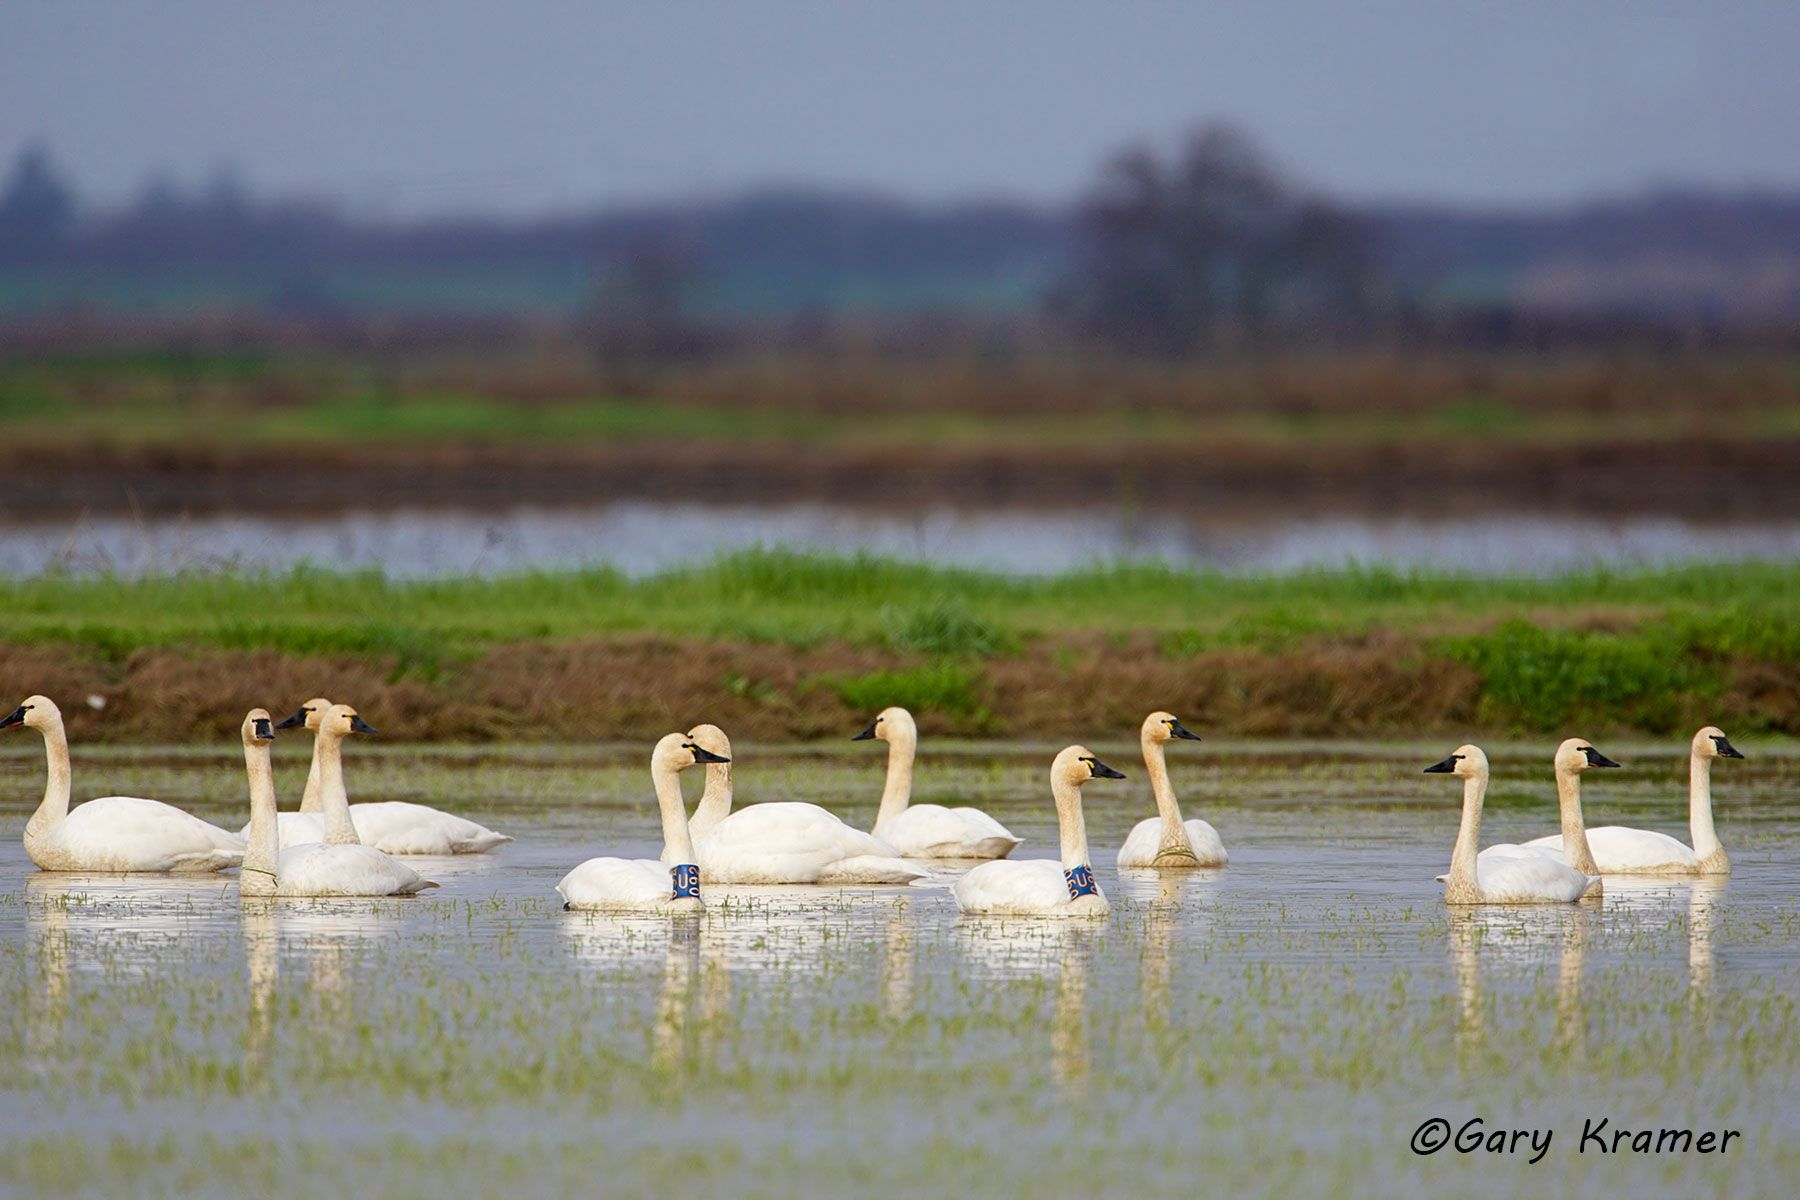 Tundra (Whistling) Swan (Cygnus columbianus) - NBWT#205d